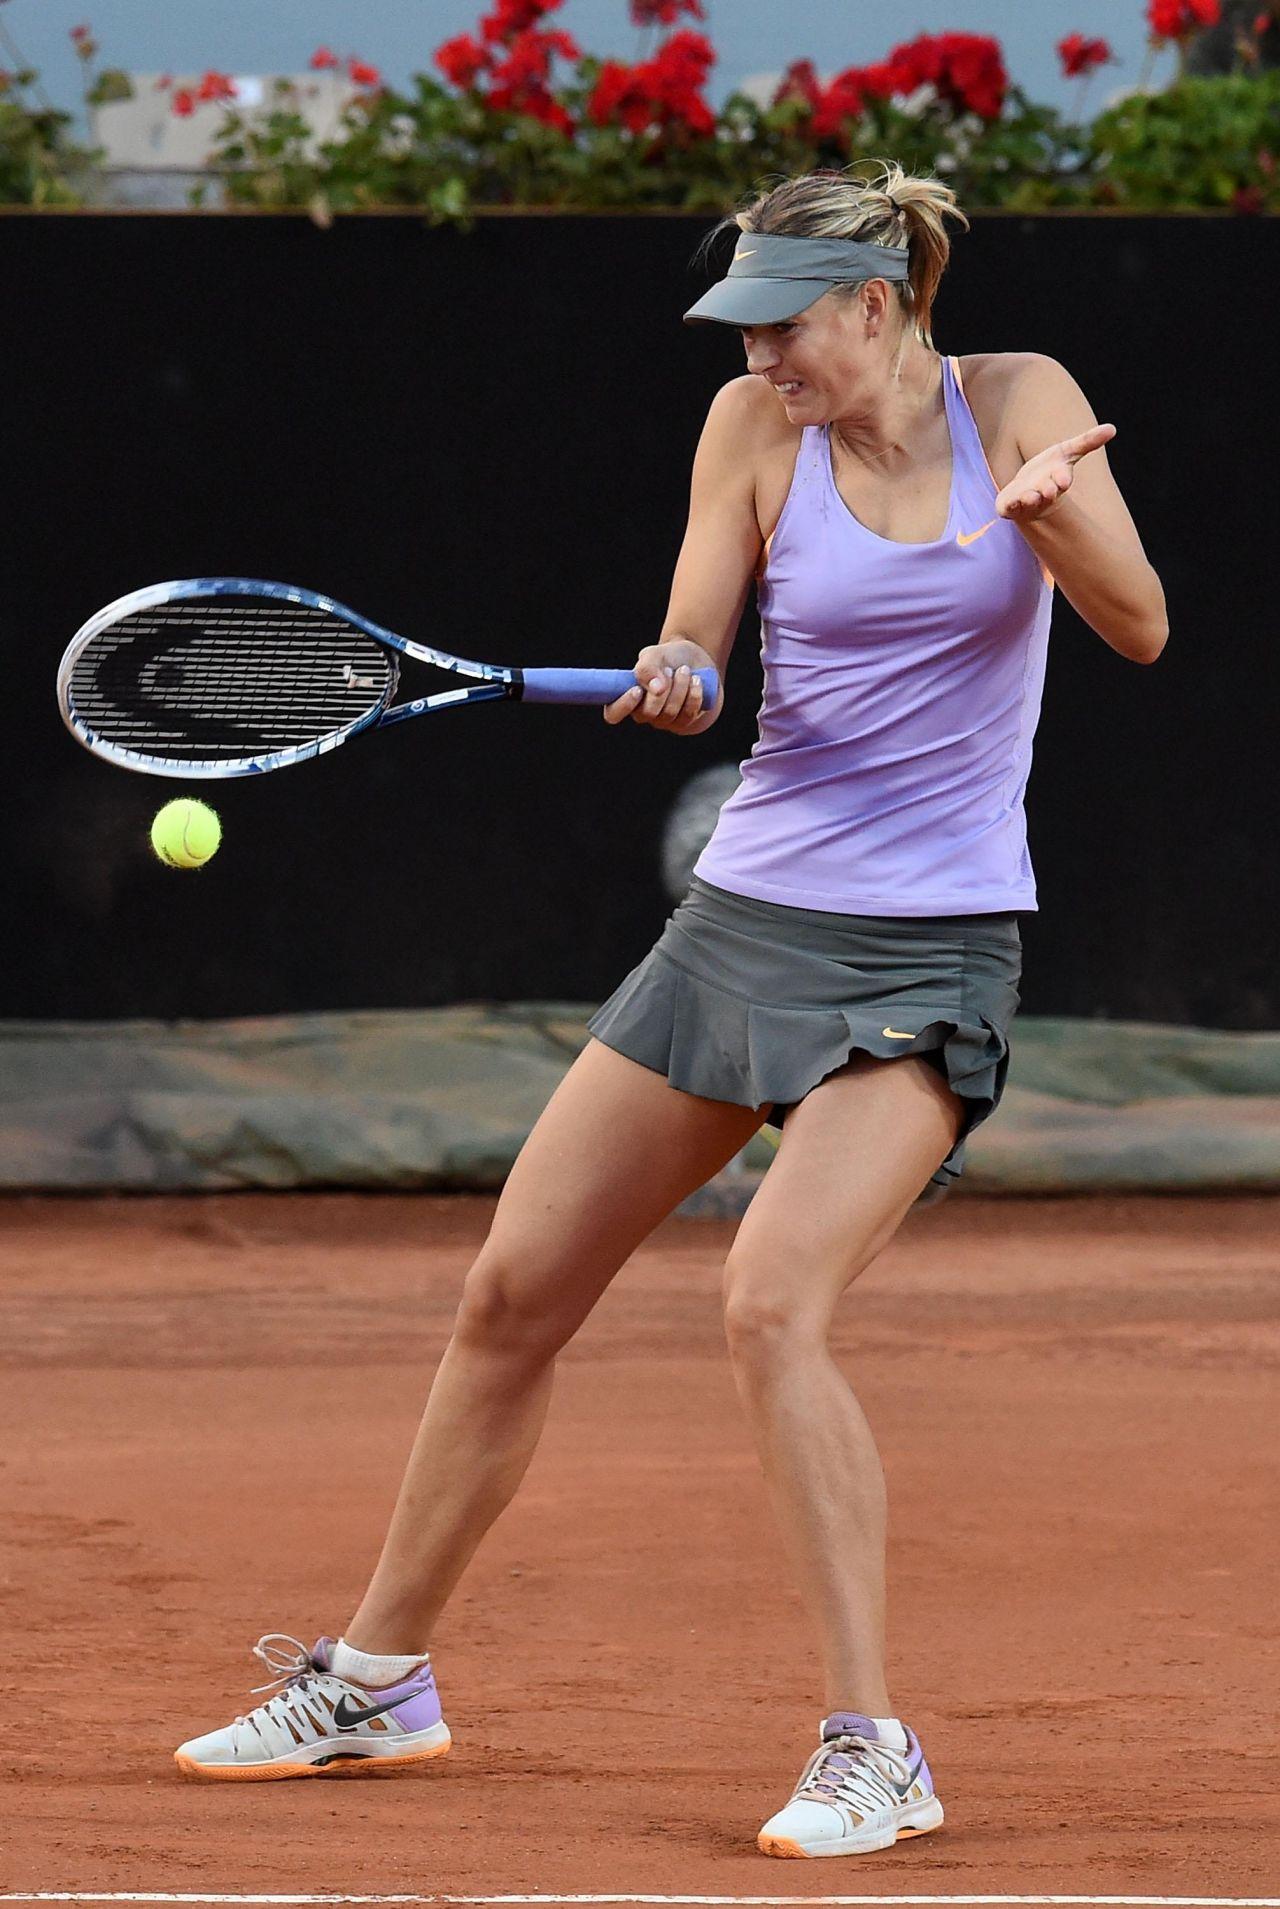 rome open tennis 2014 schedule - photo#28